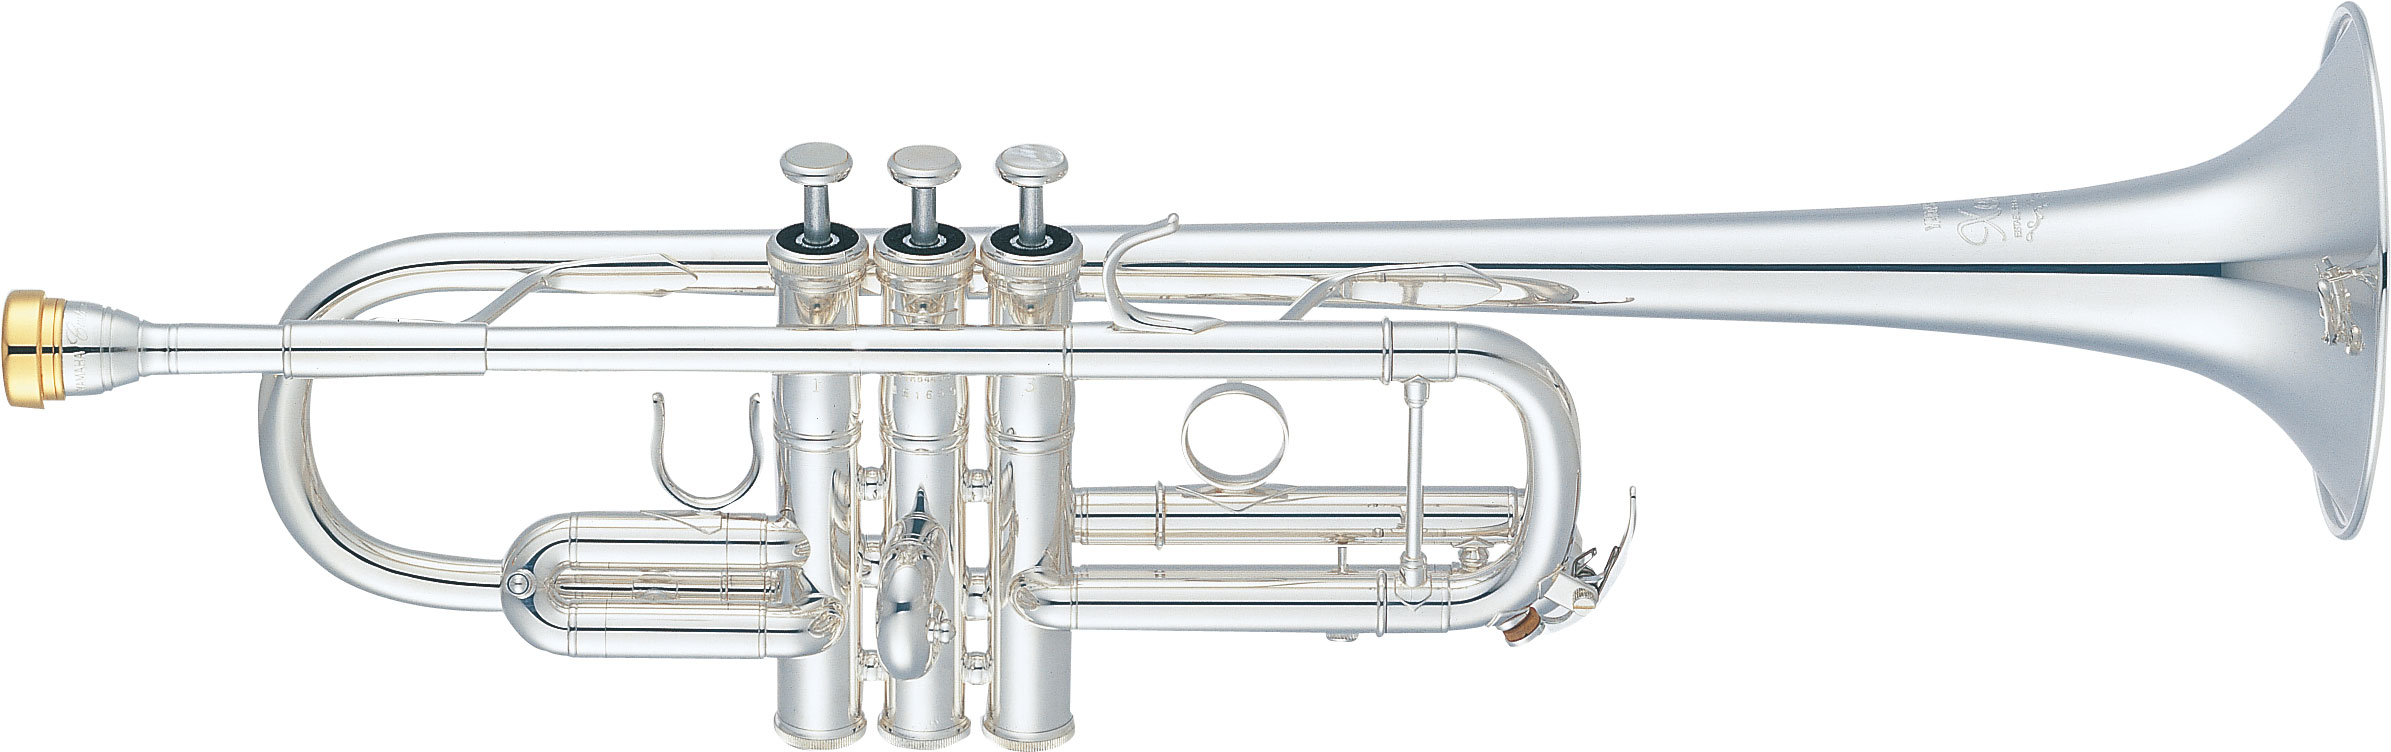 C Trumpet Yamaha Xeno YTR-8445GS - Uitvoering: verzilverd